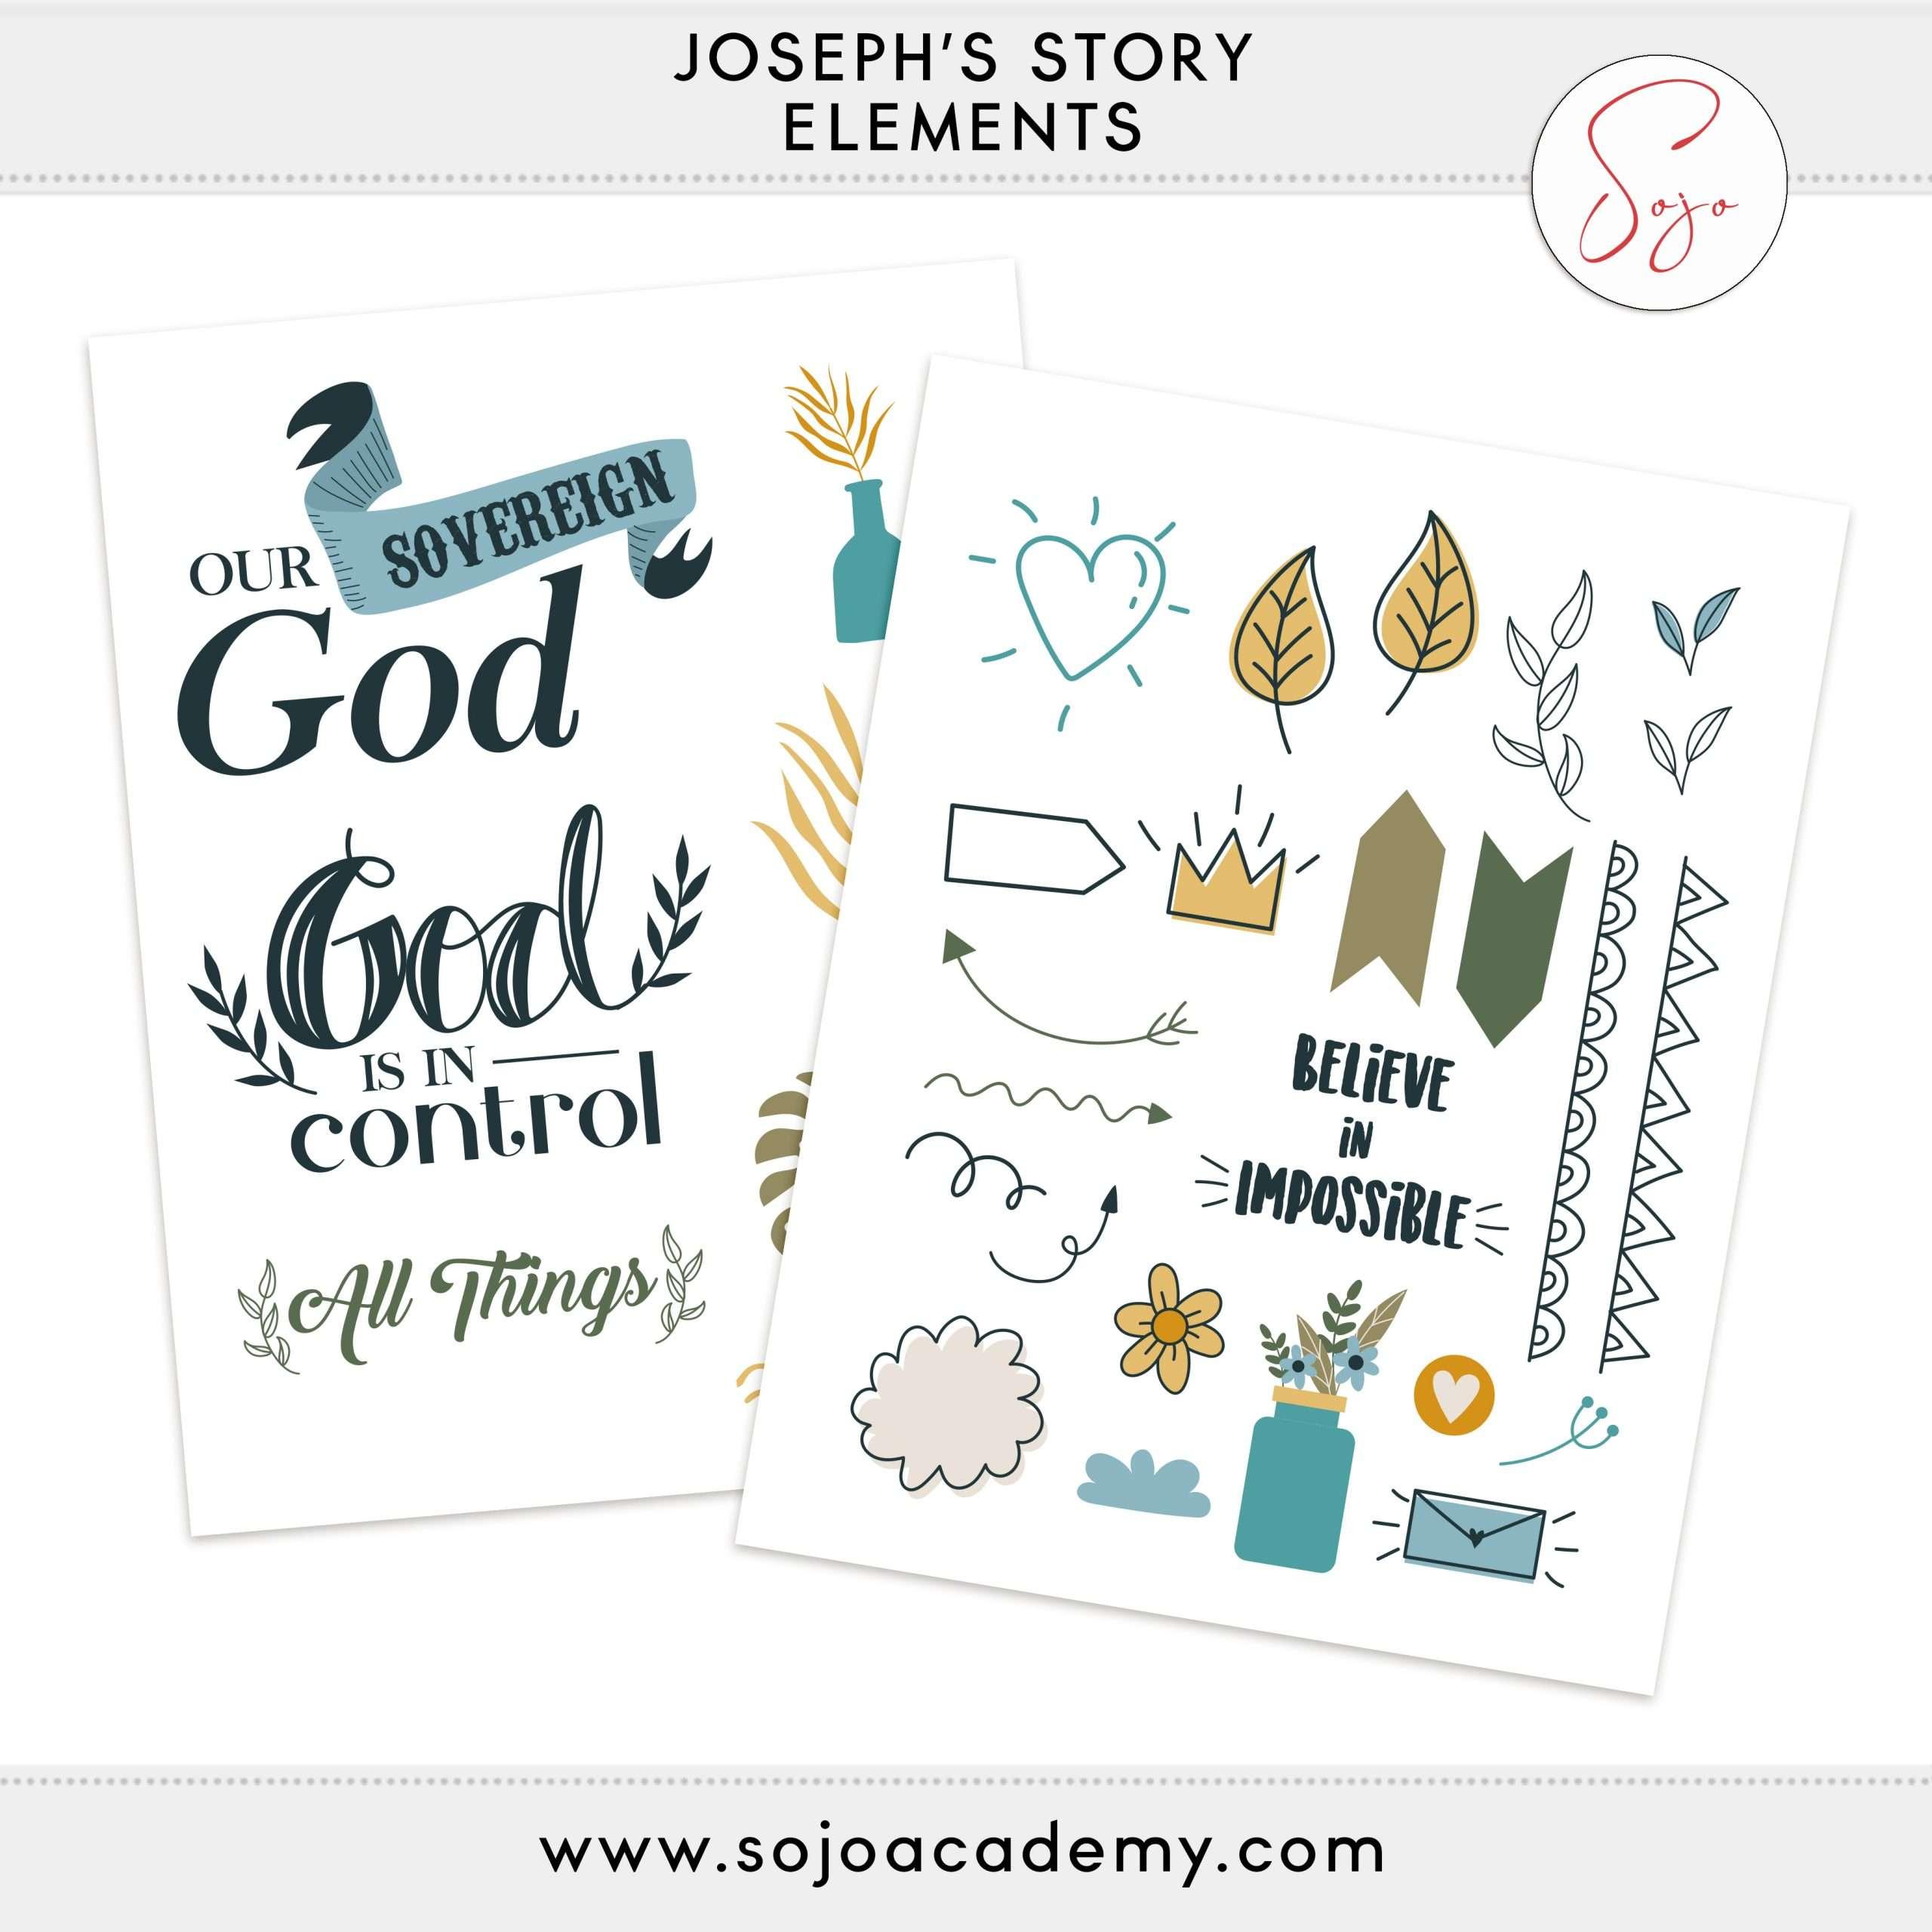 Sojo_November_JosephsStory_Preview_Elements